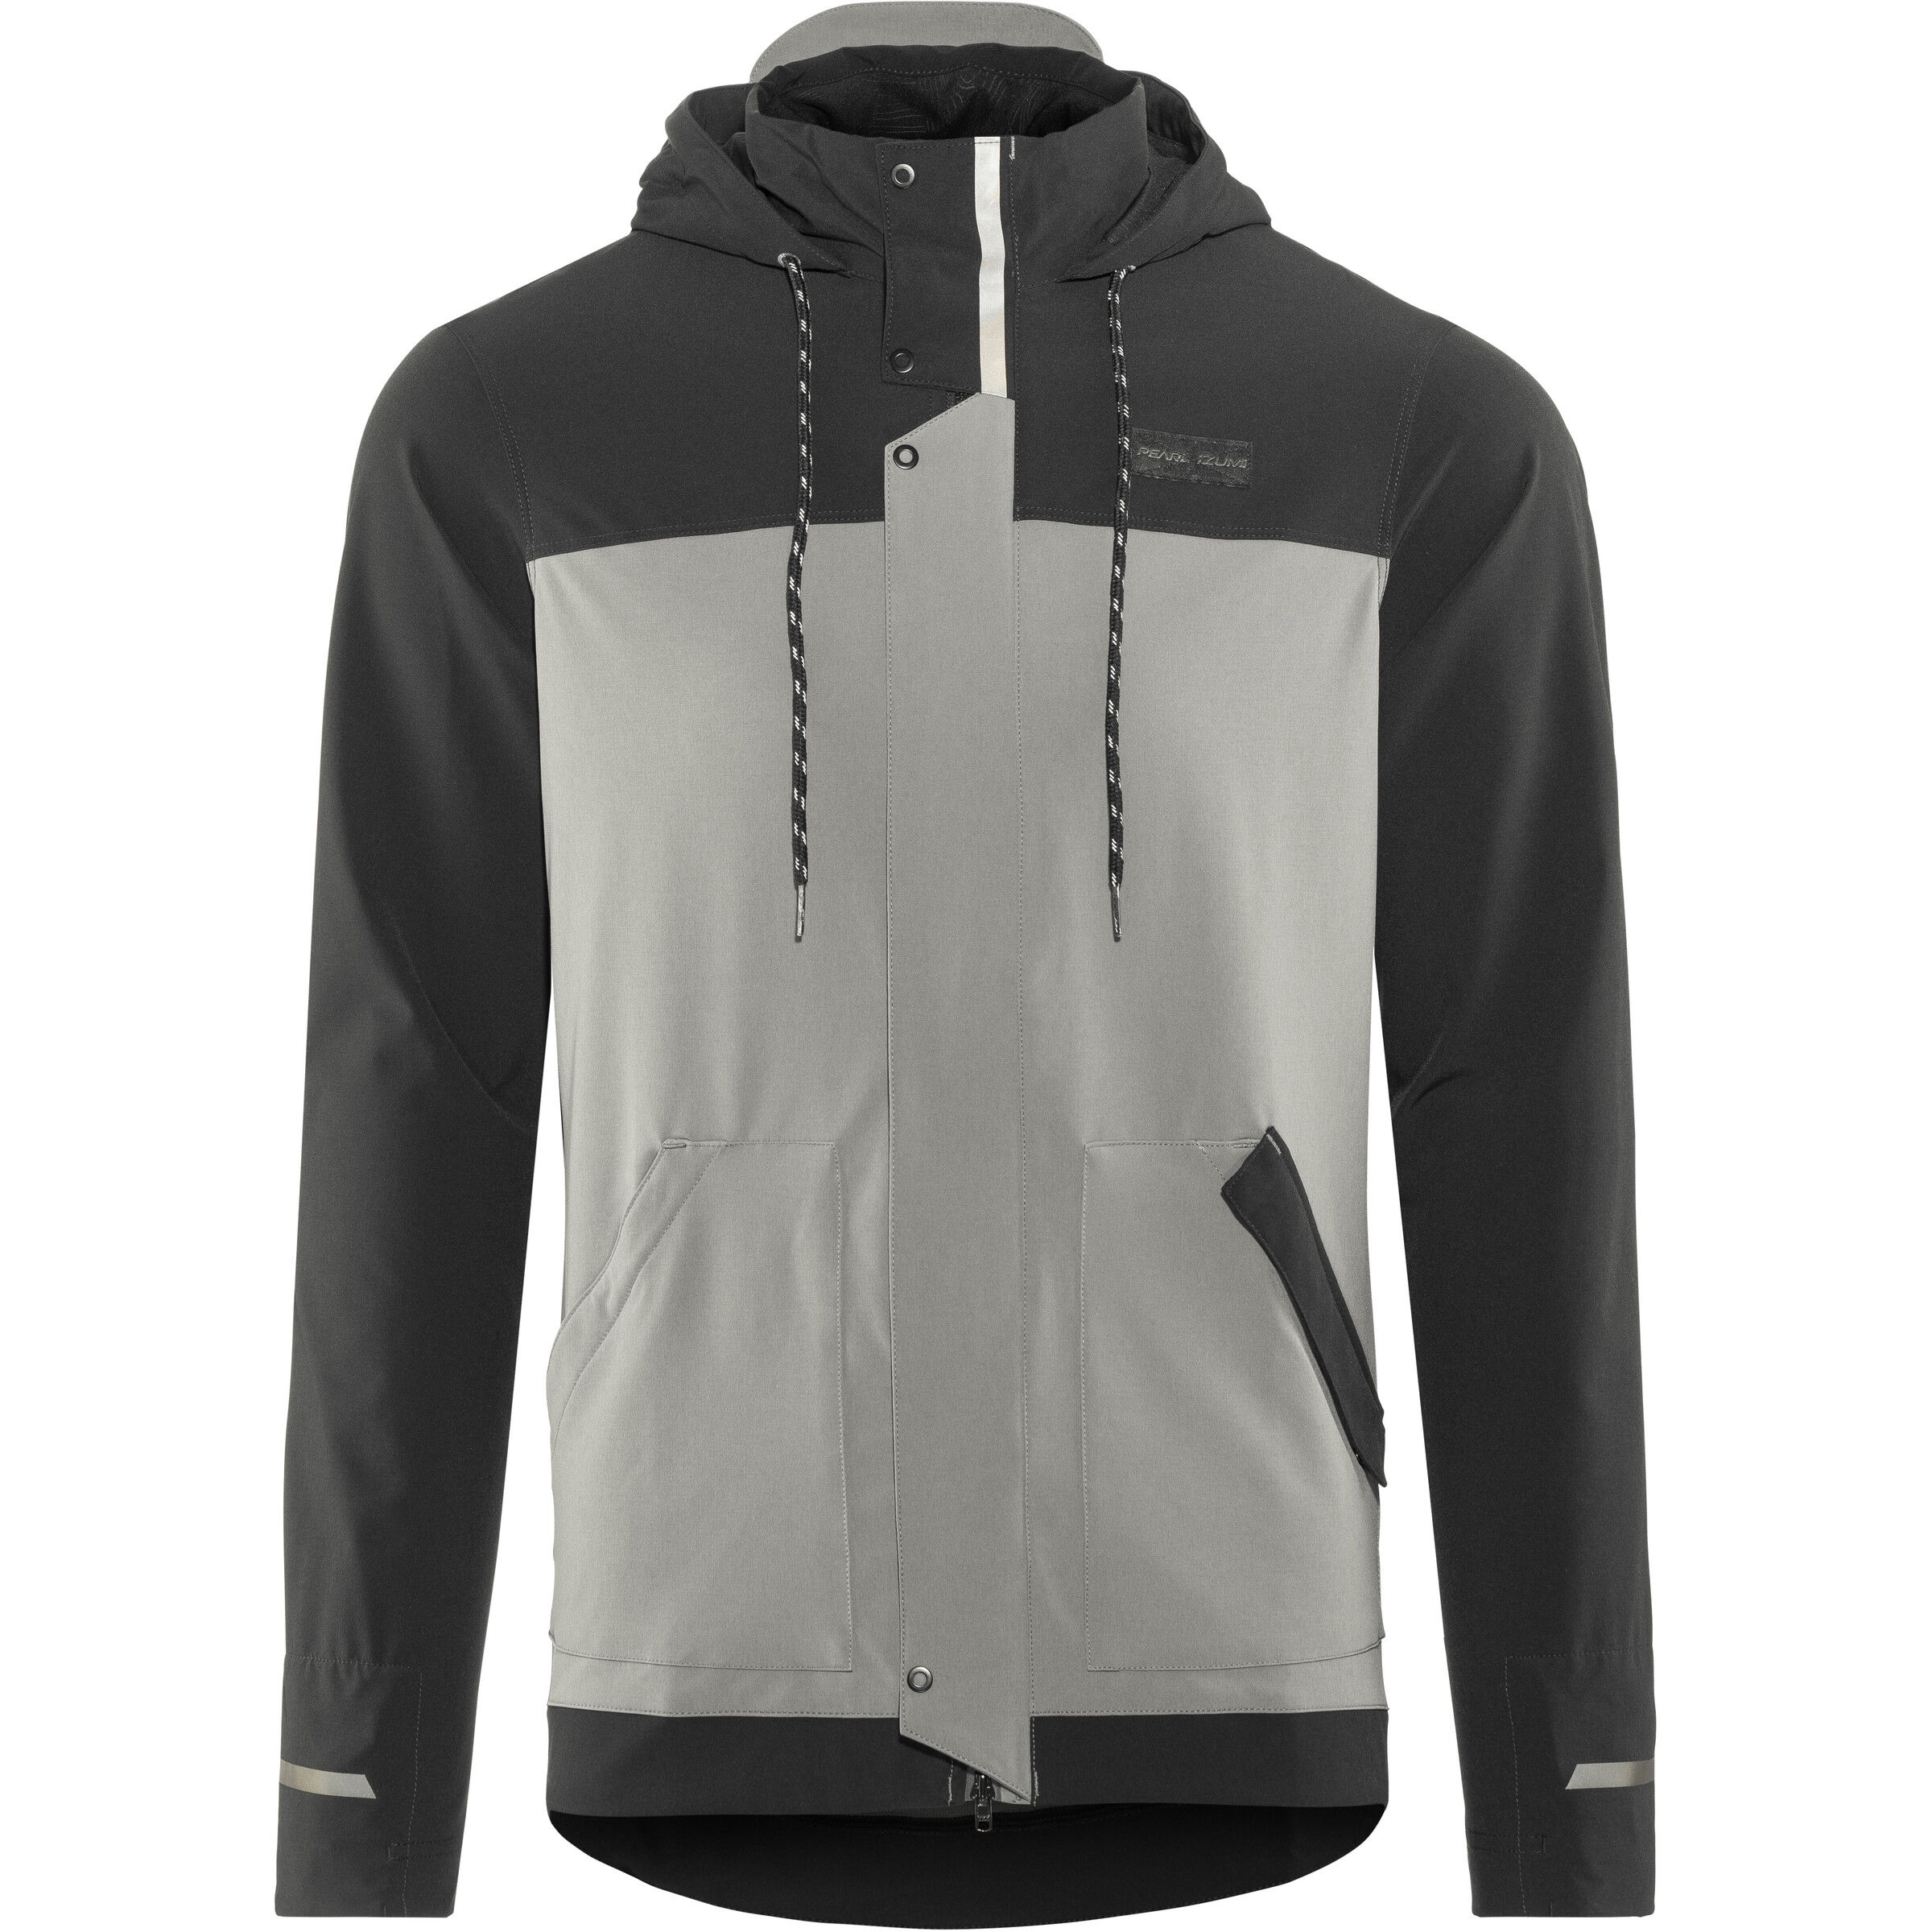 PEARL iZUMi Versa Barrier Jacket Herren blacksmoked pearl